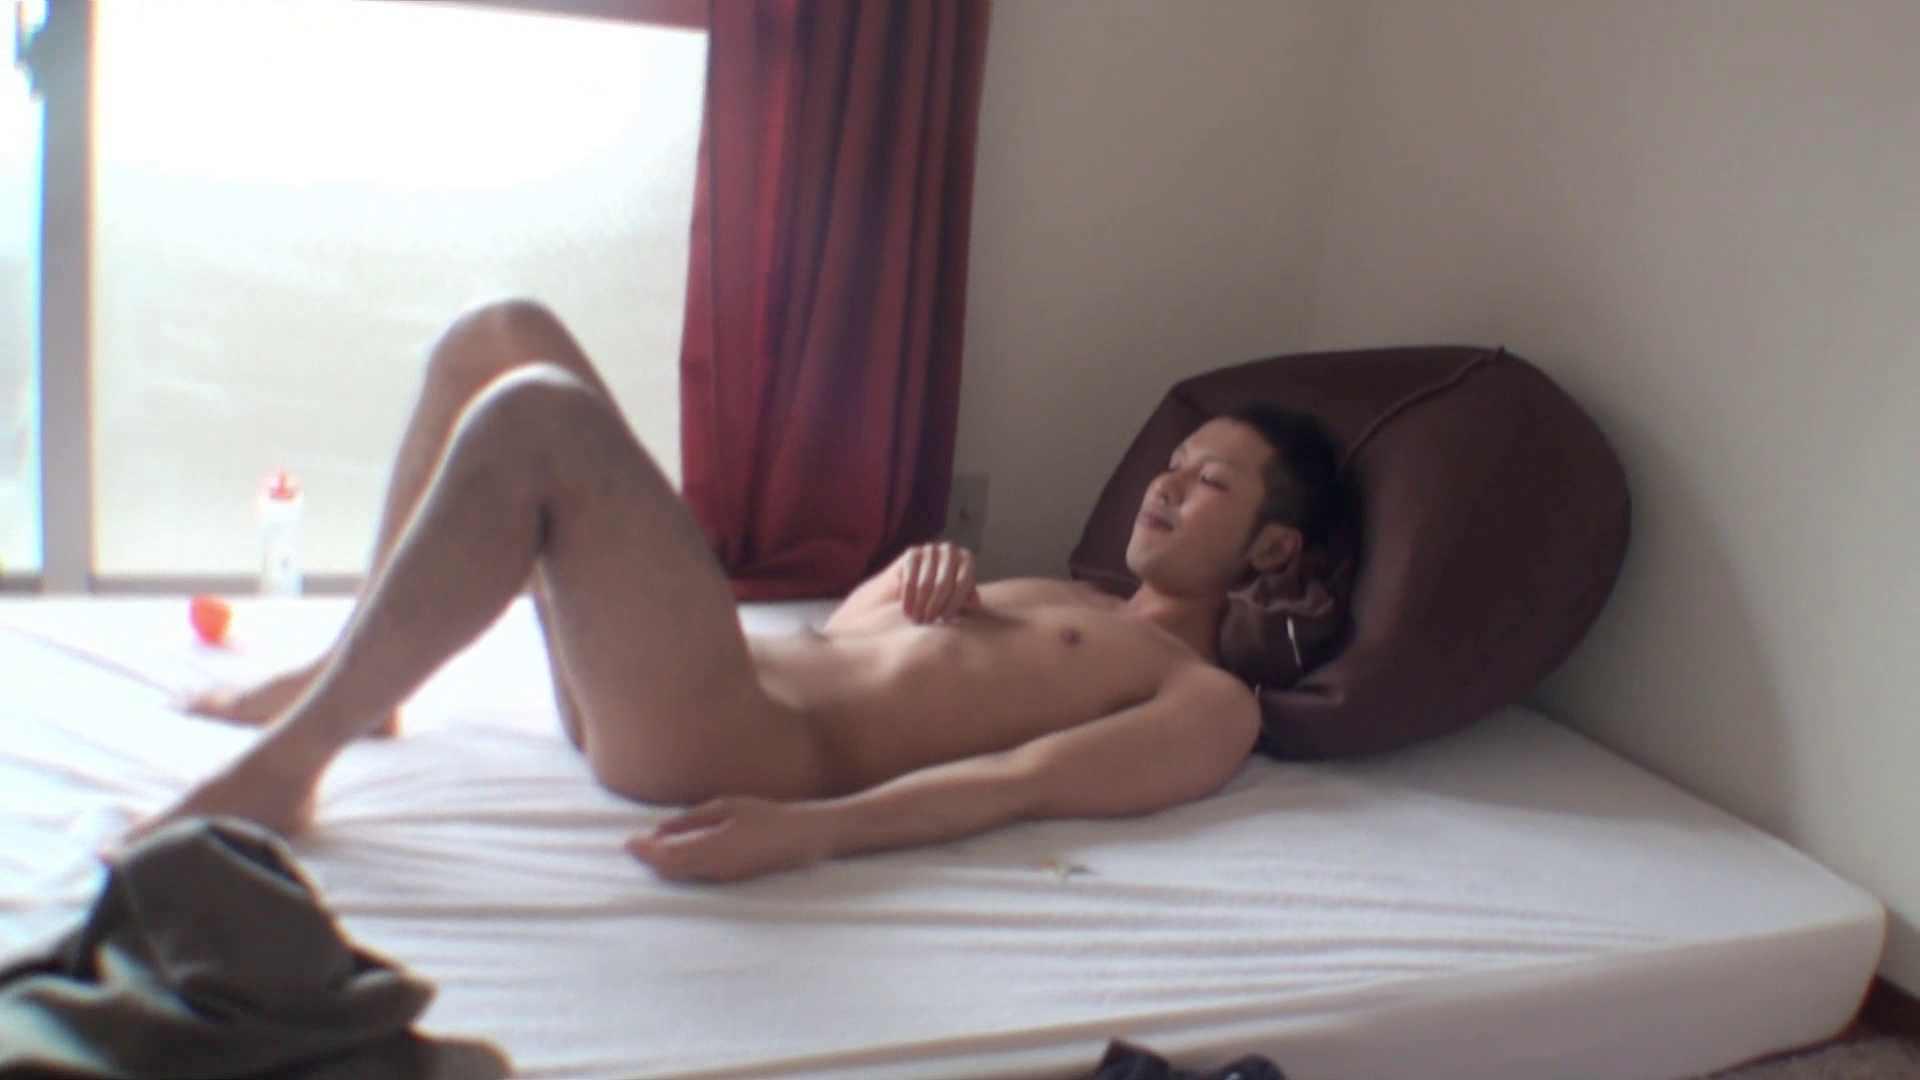 HD 良太と健二当たり前の日常 セックス編 手コキ技あり ゲイフリーエロ画像 65枚 44